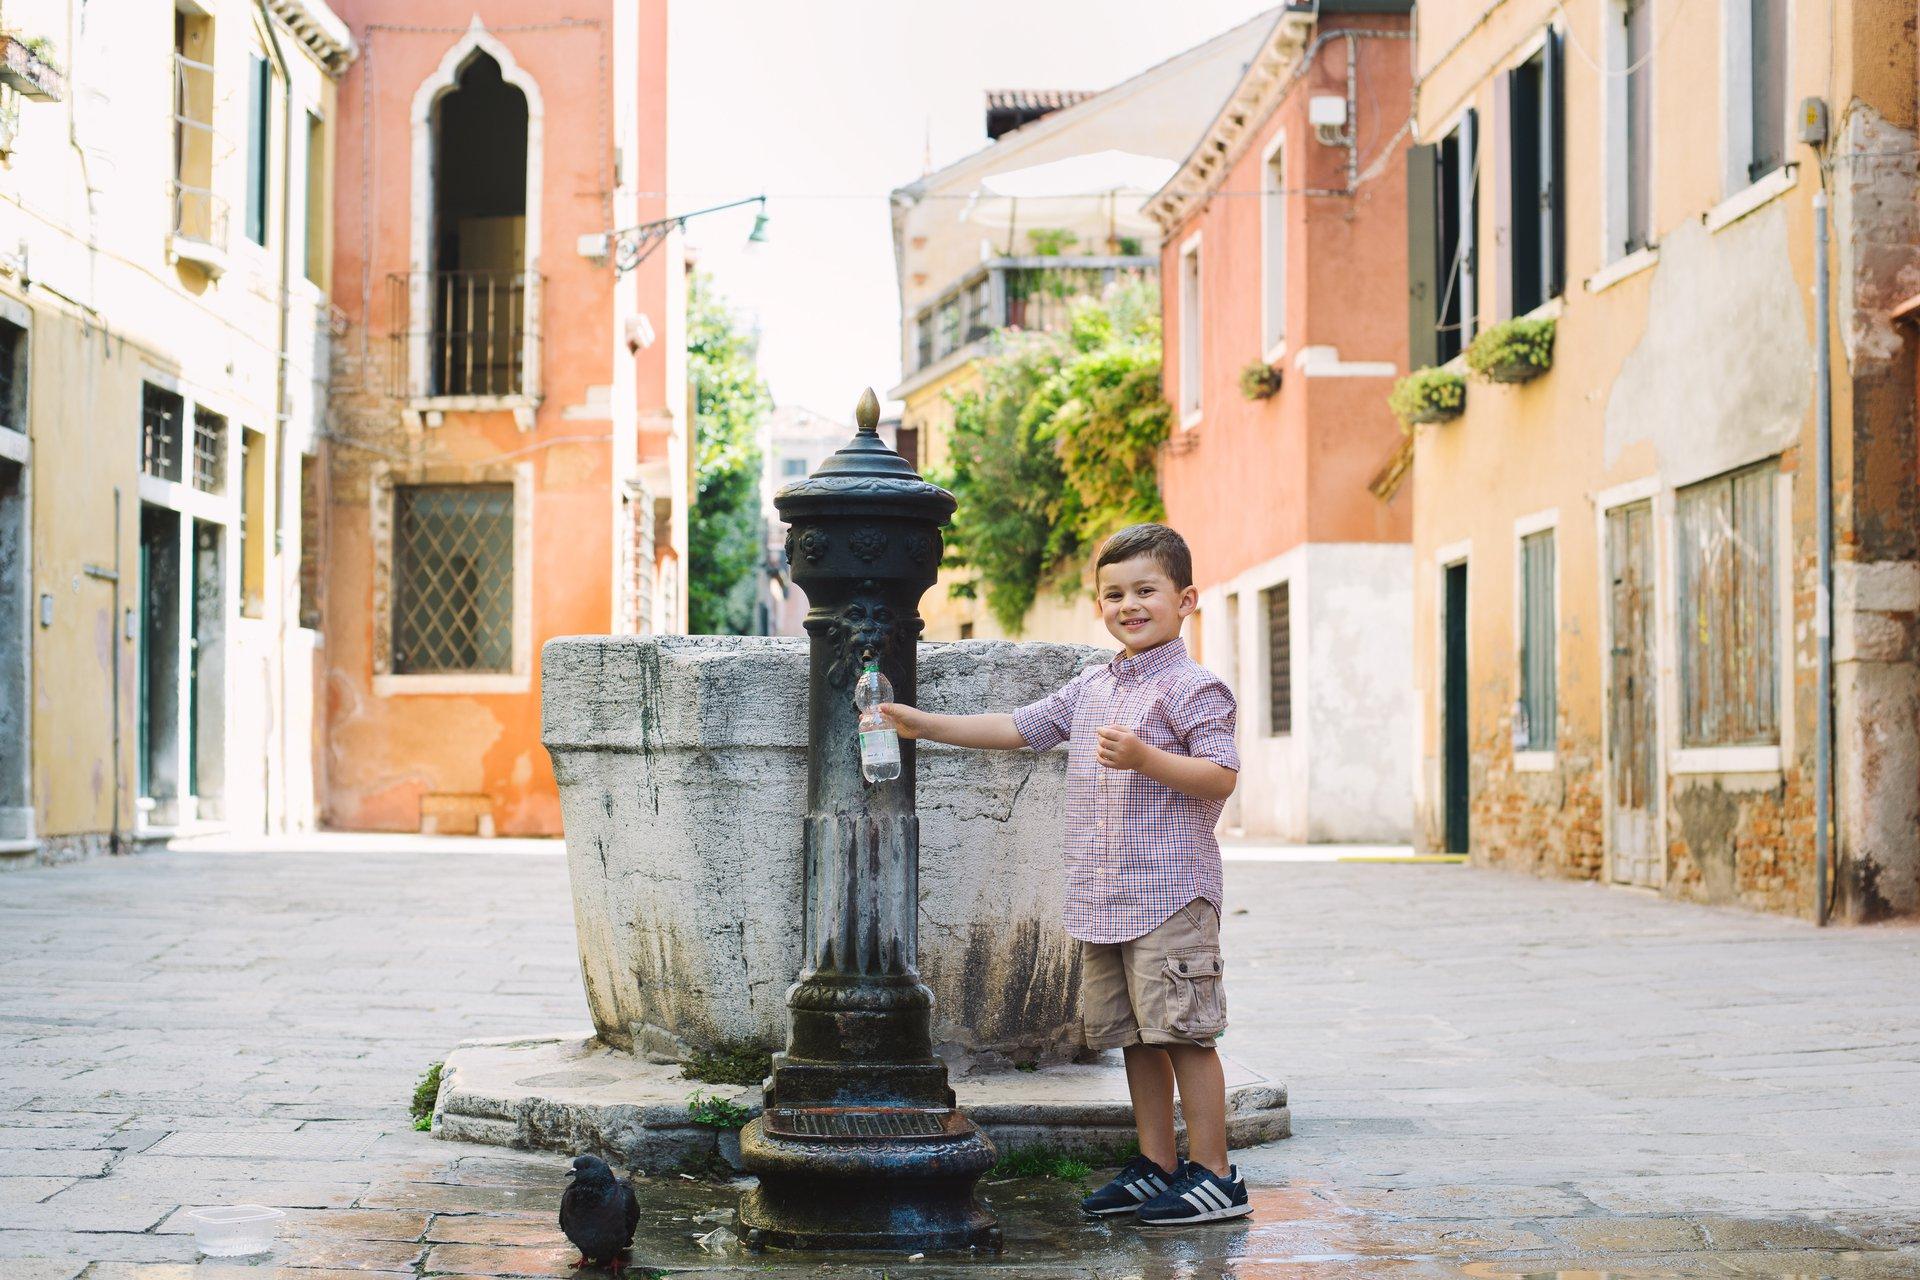 Venice-Italy-travel-story-Flytographer-17